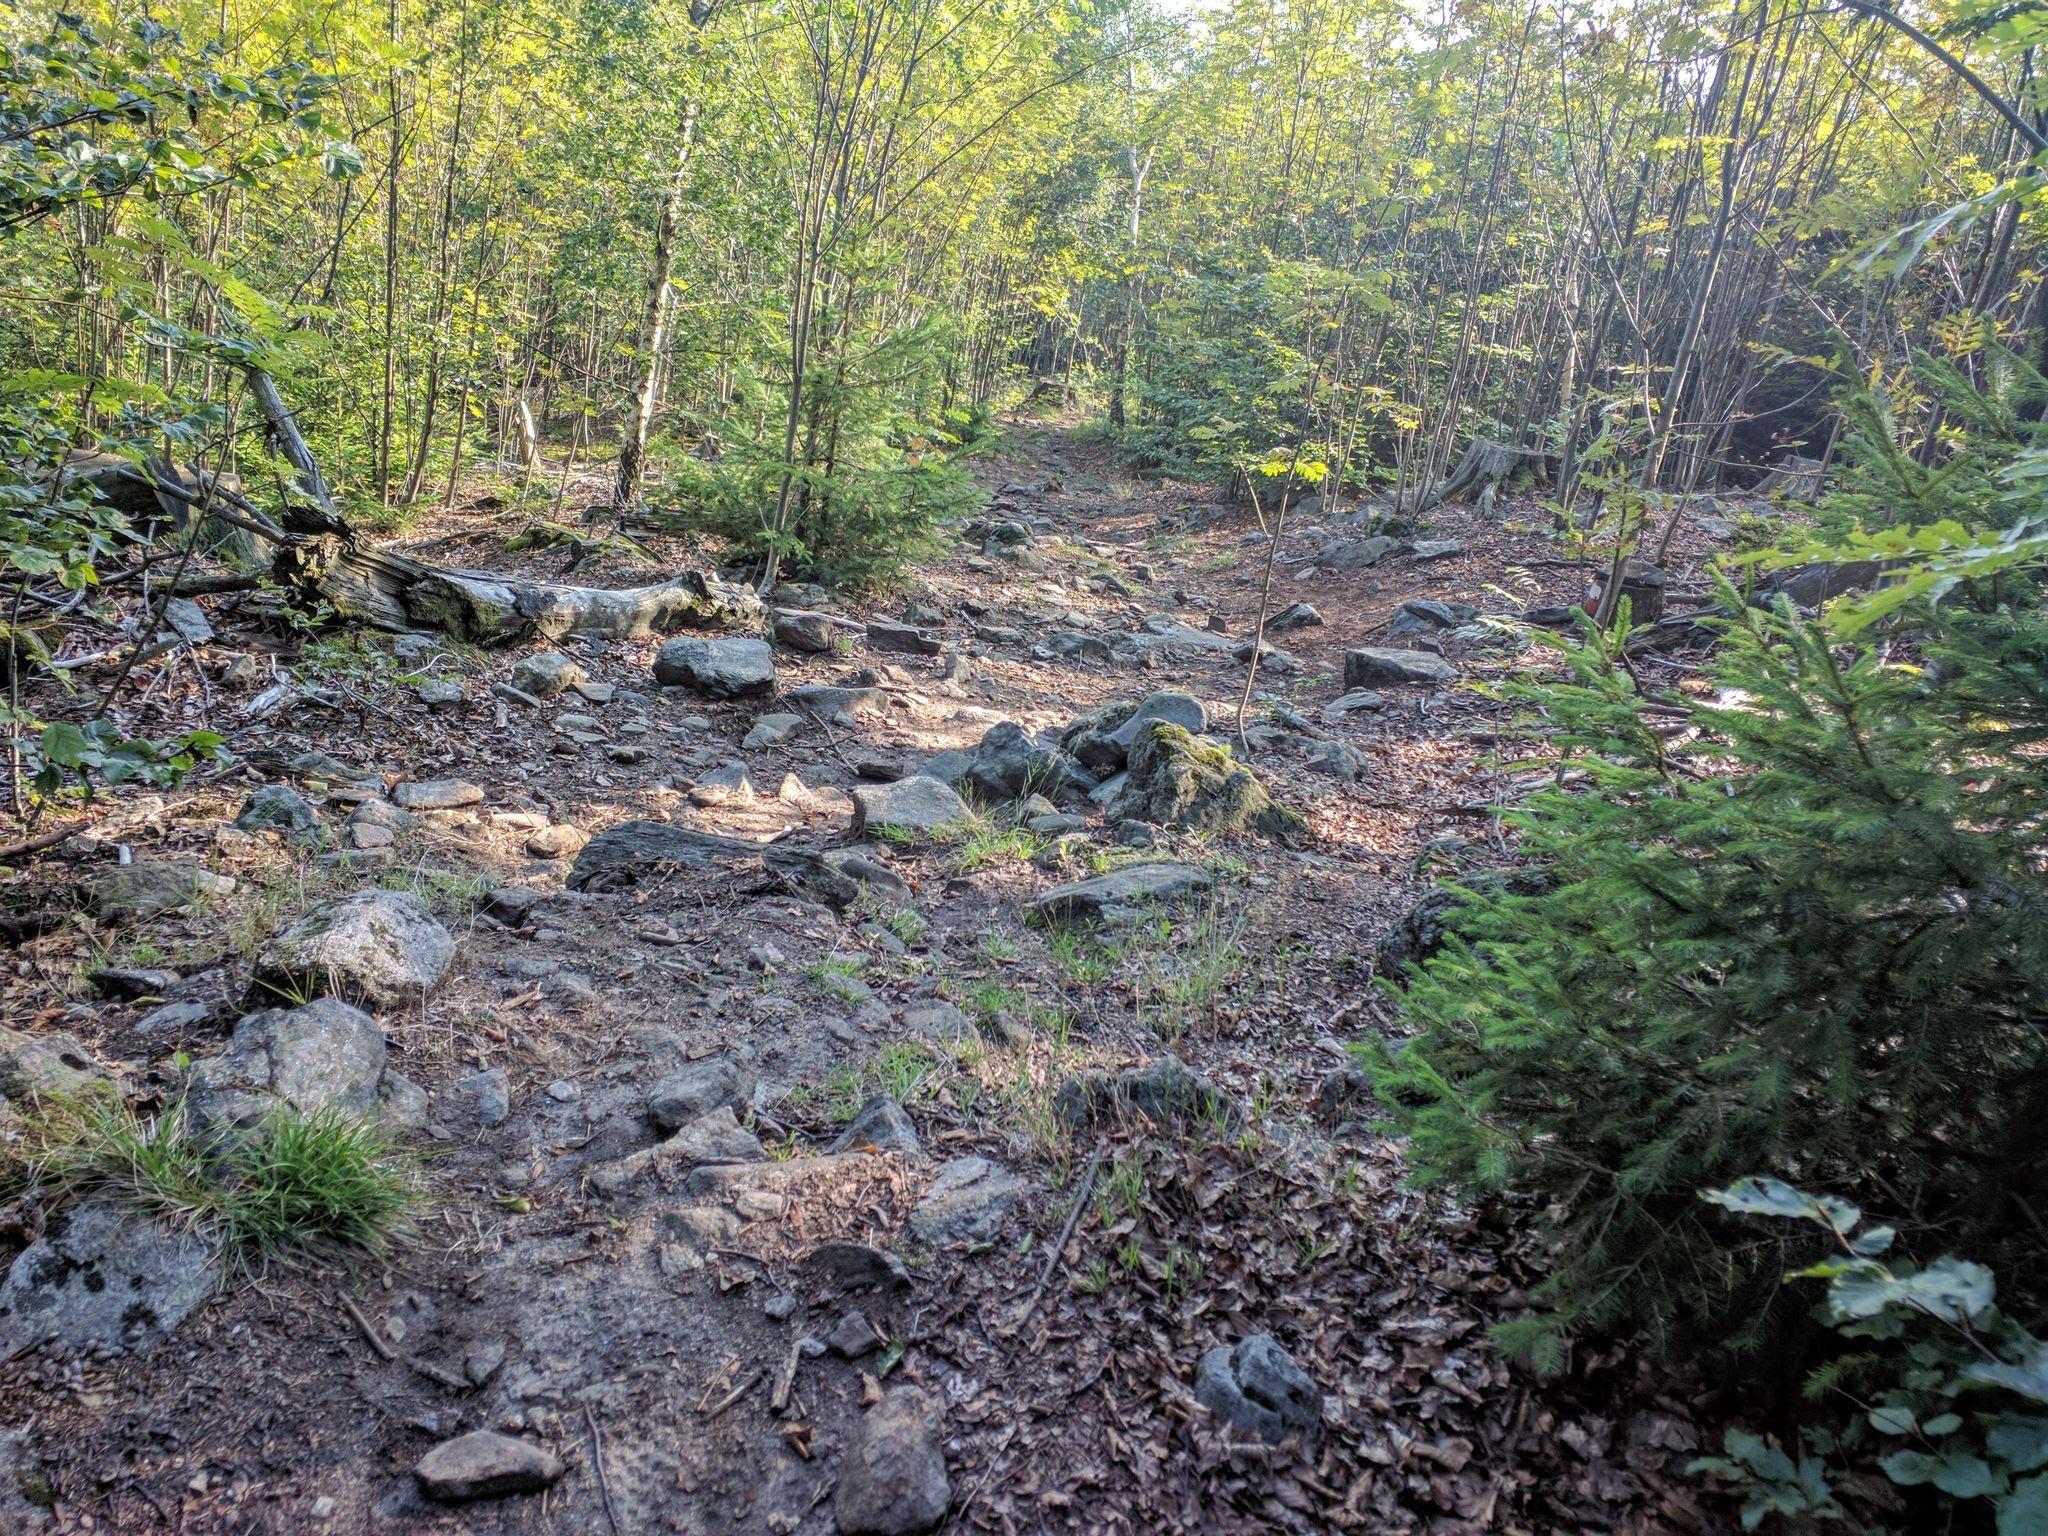 Trail am Reiseck